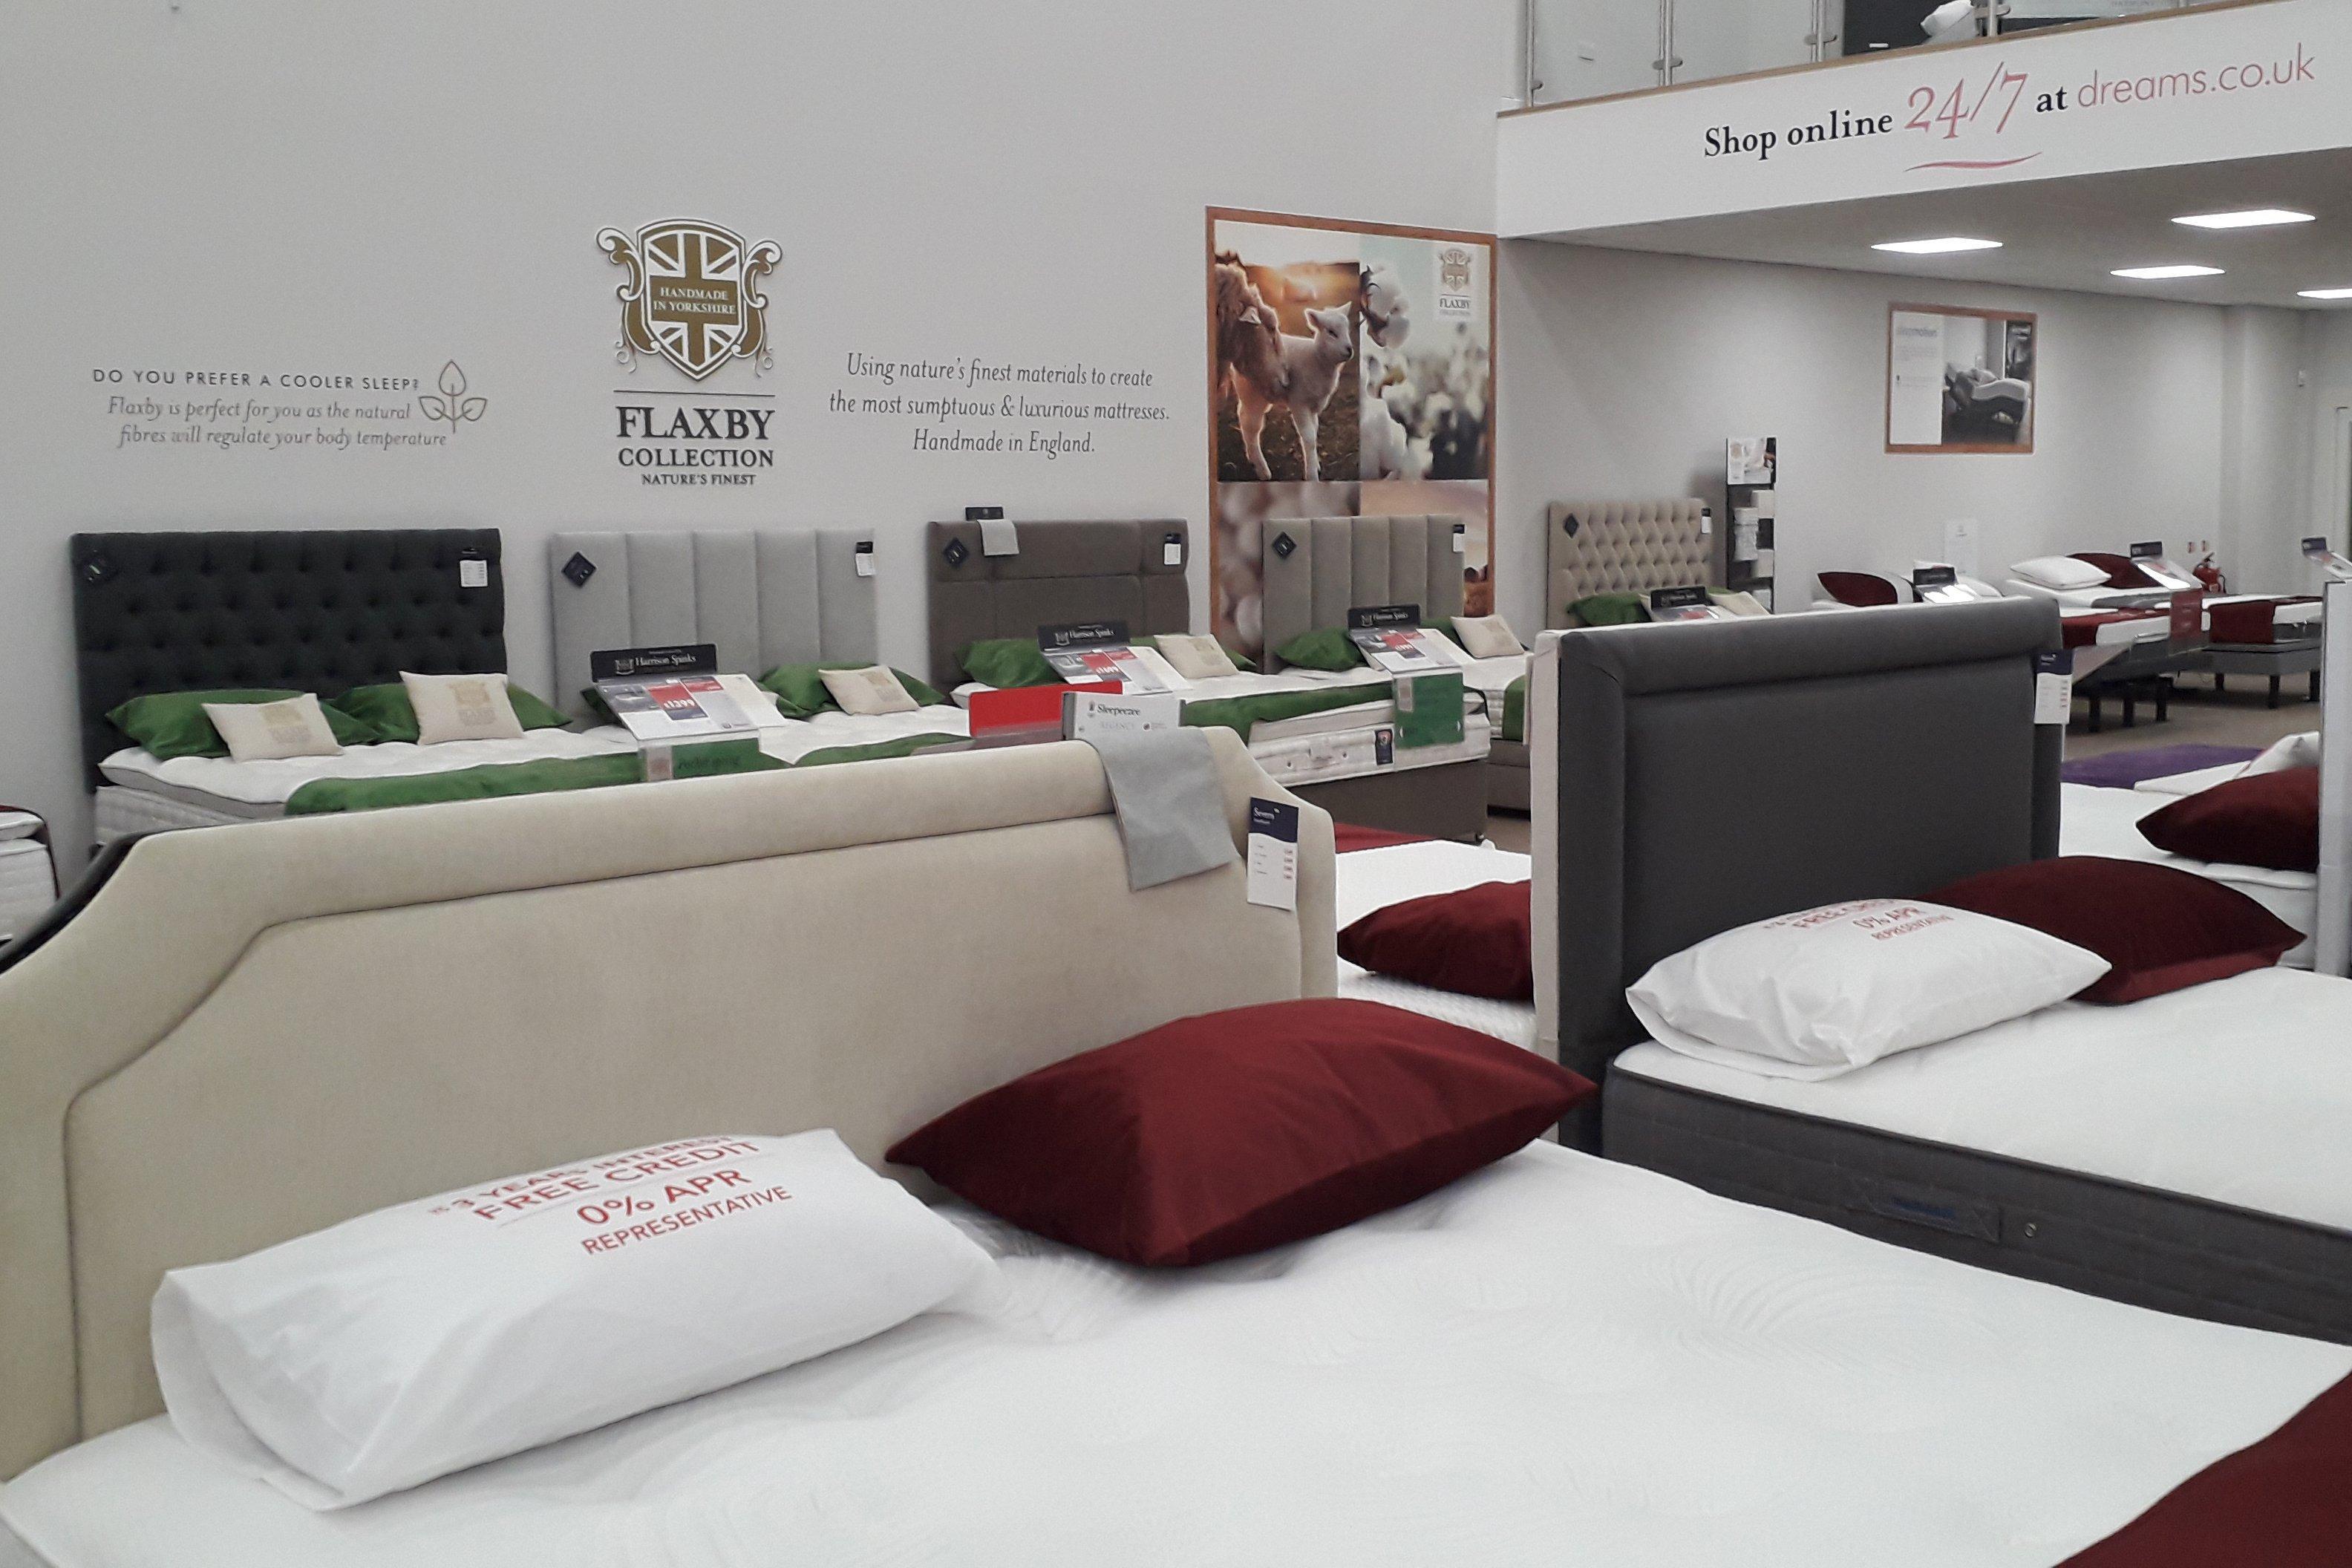 Dreams Store in Hull - Beds, Mattresses & Furniture  Dreams